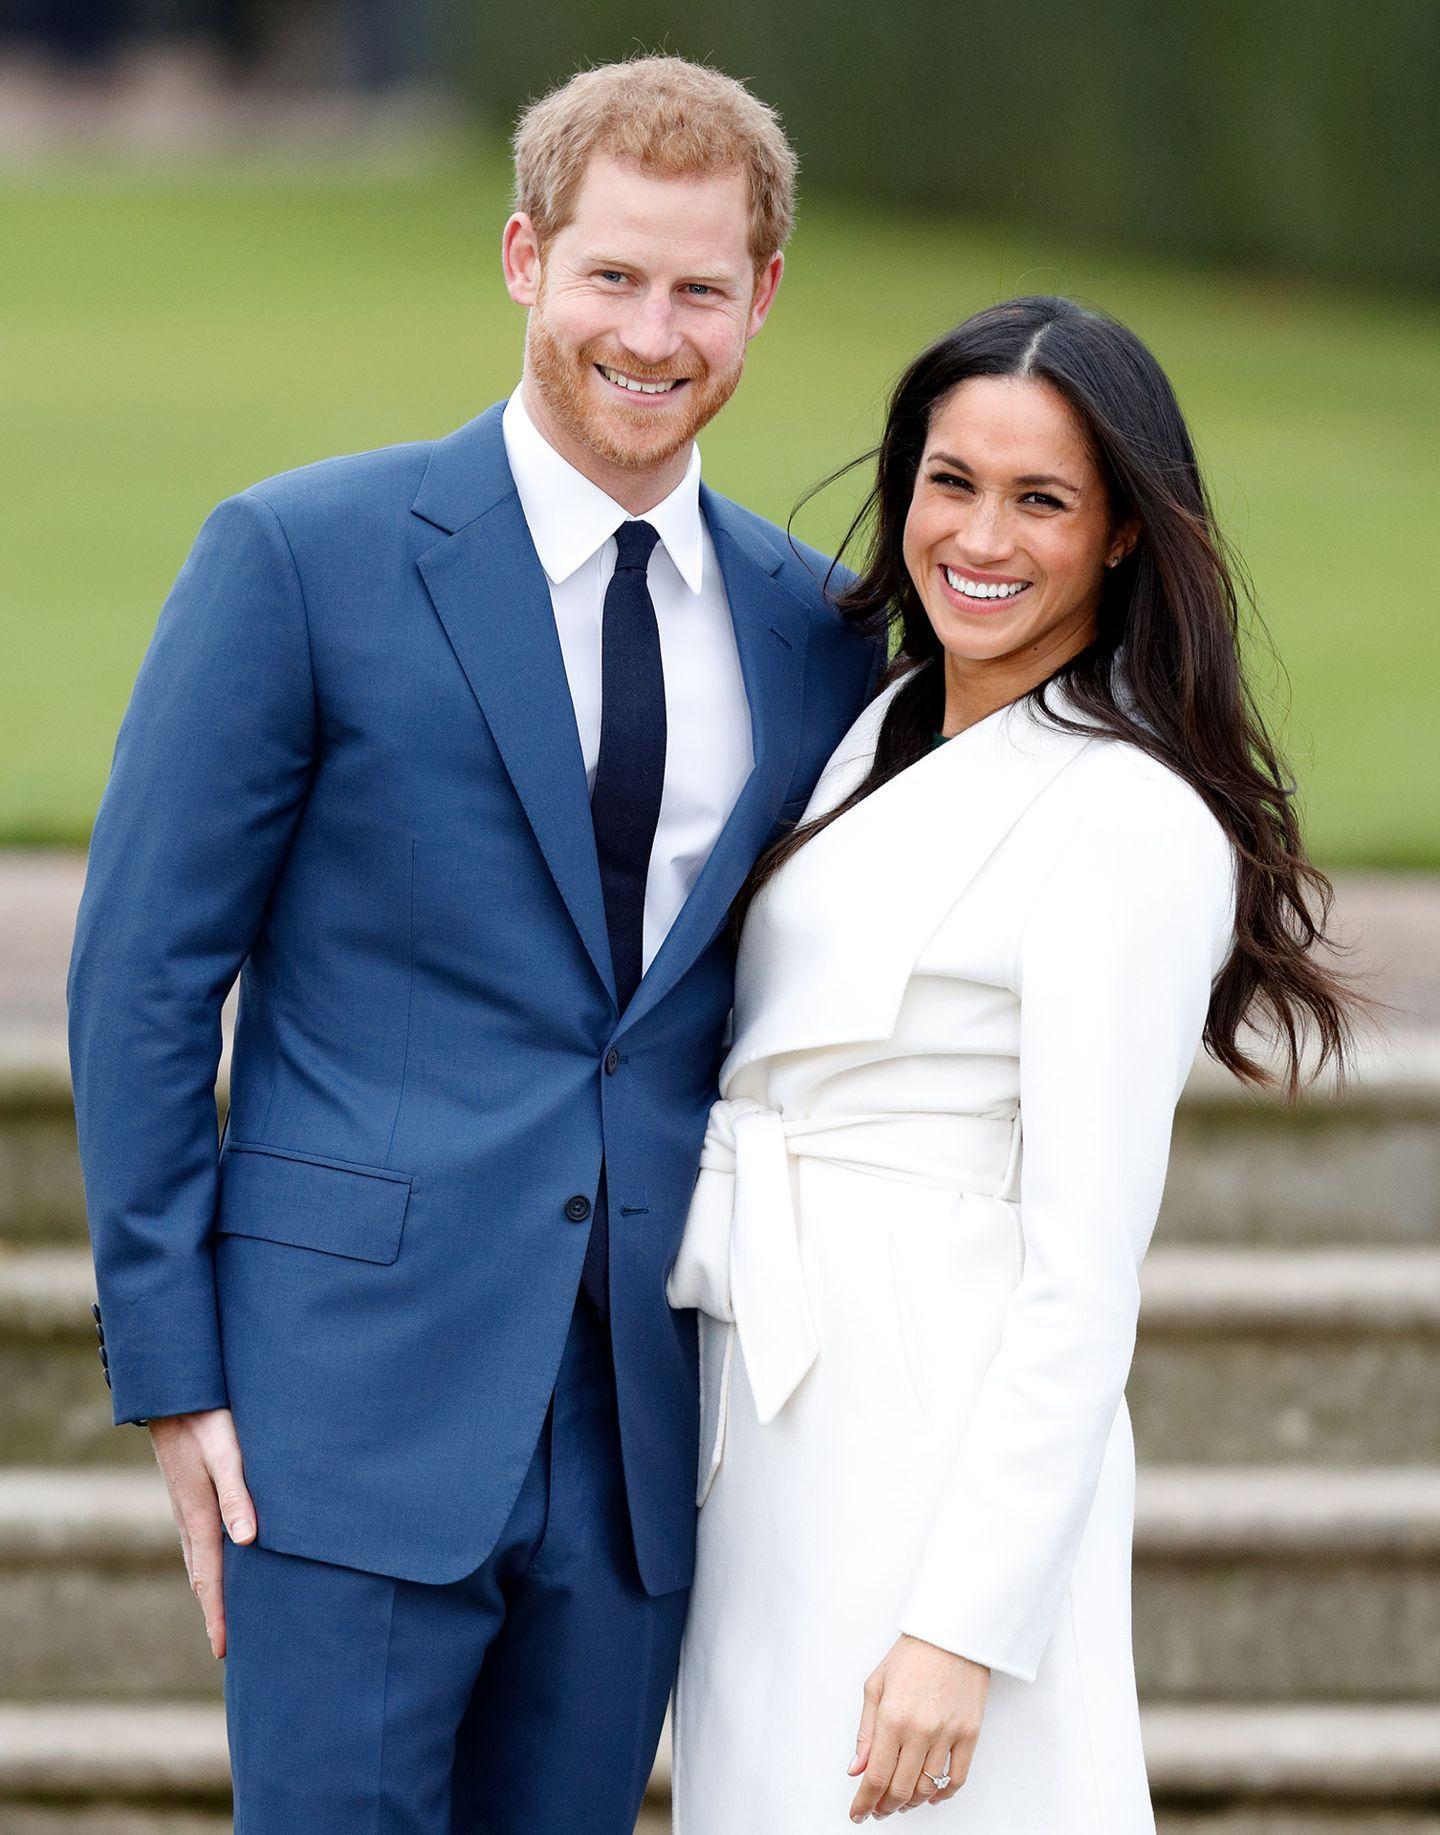 Royal Wedding 2018 Date.Royal Wedding 2018 Everything You Need To Know Wedding Meghan